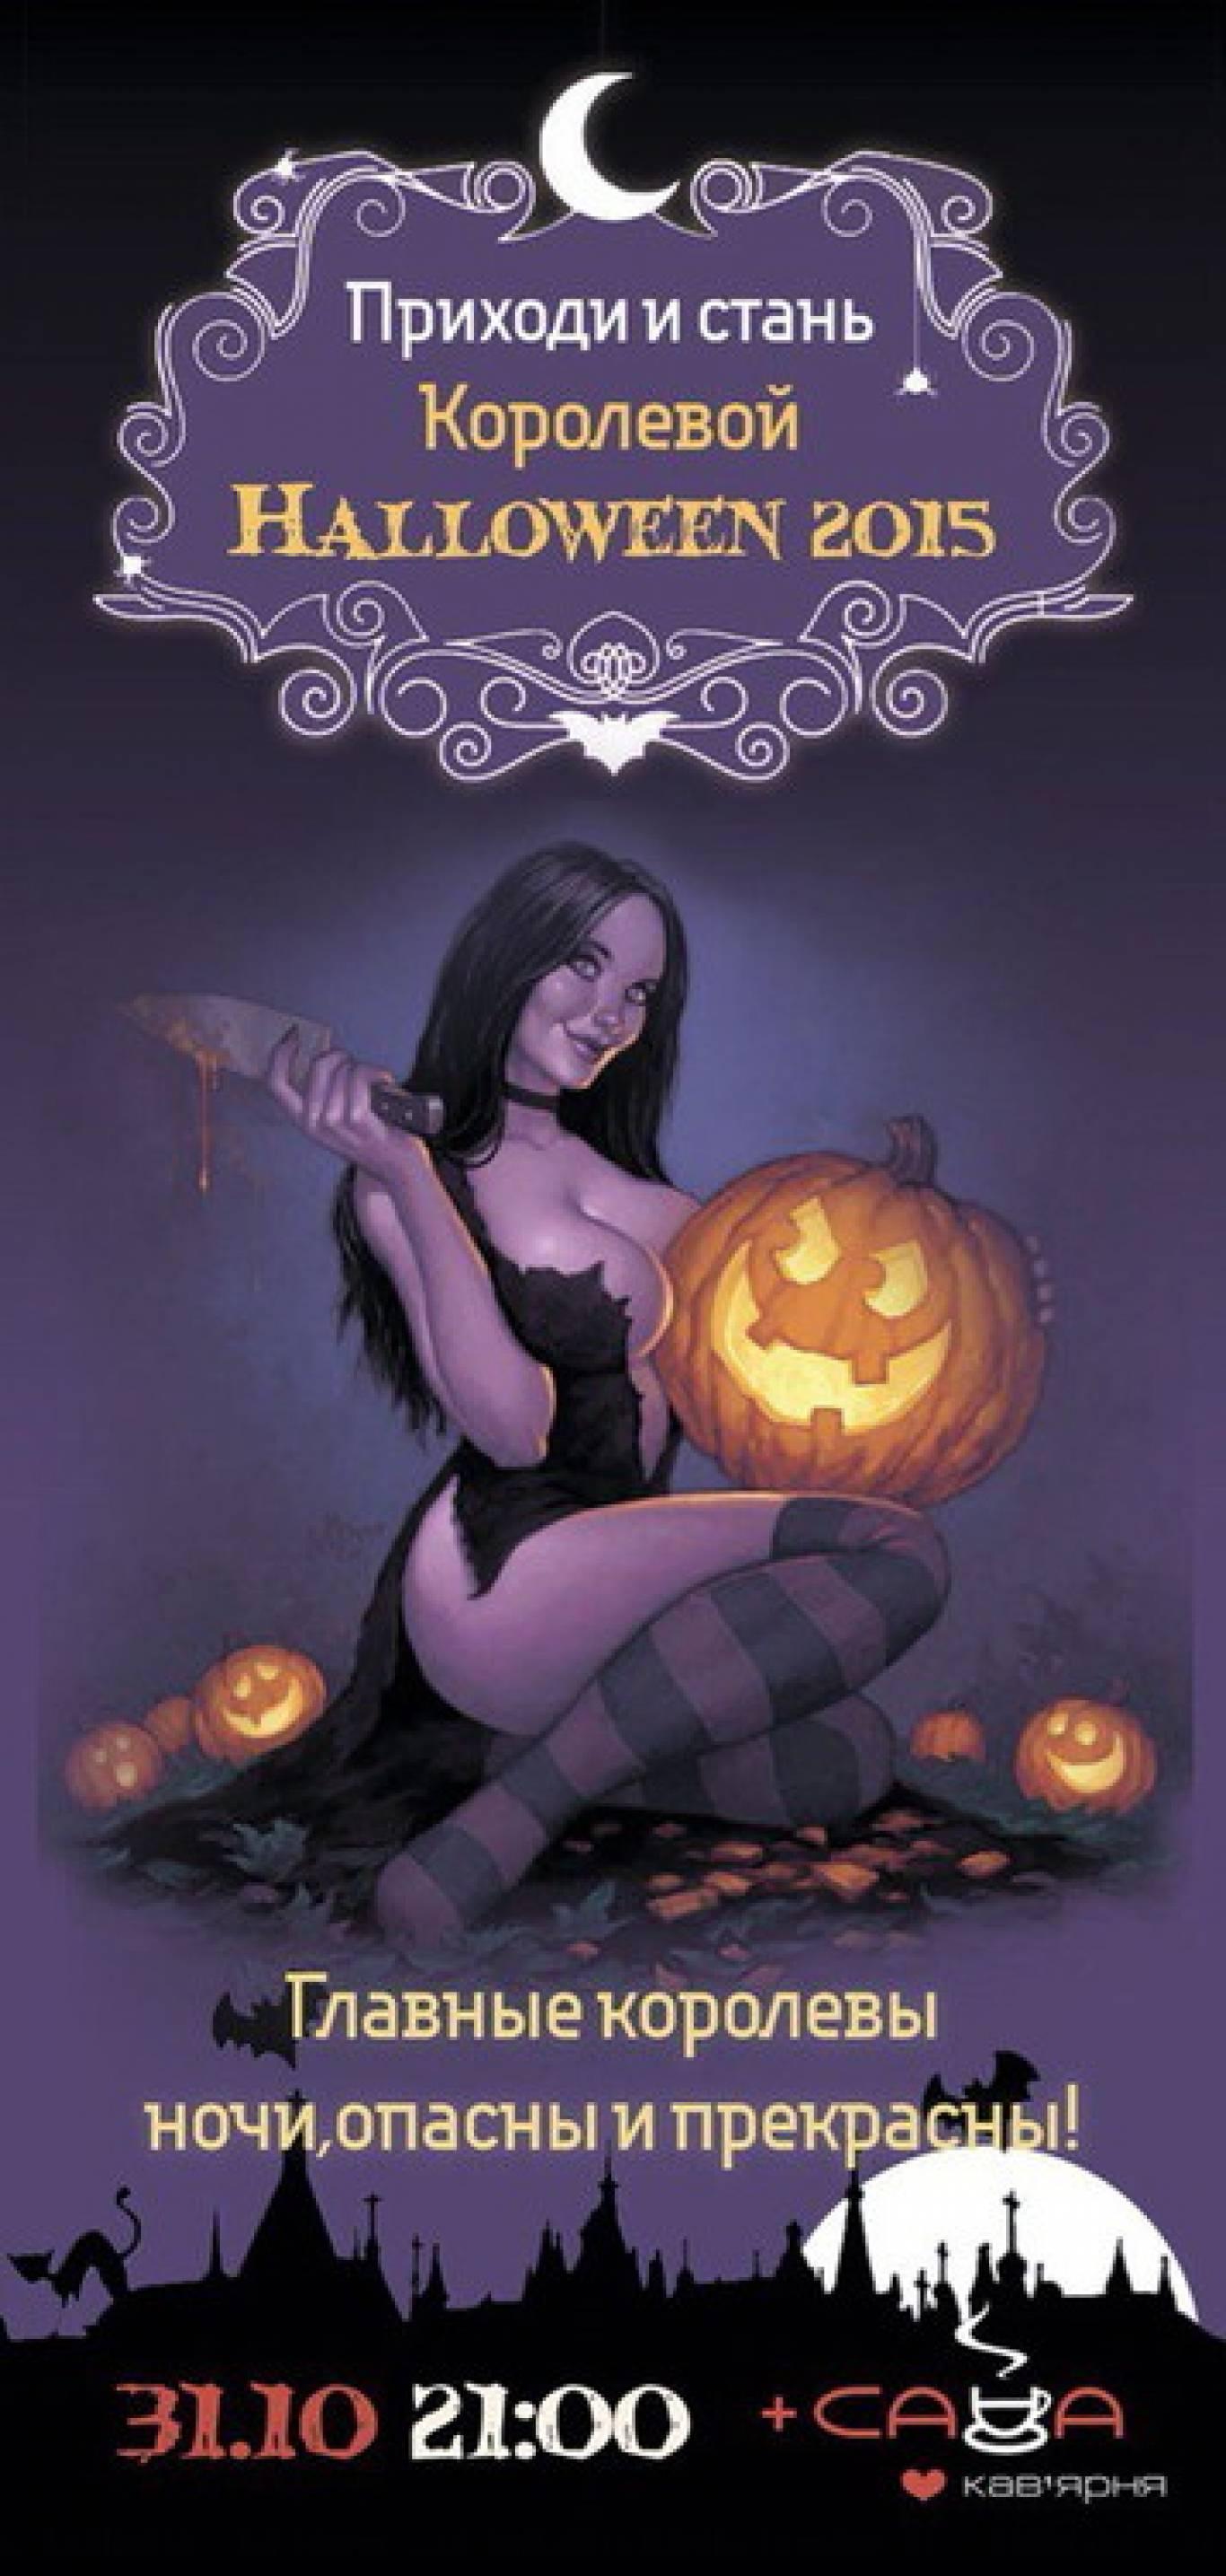 Королева Halloween в +Cava